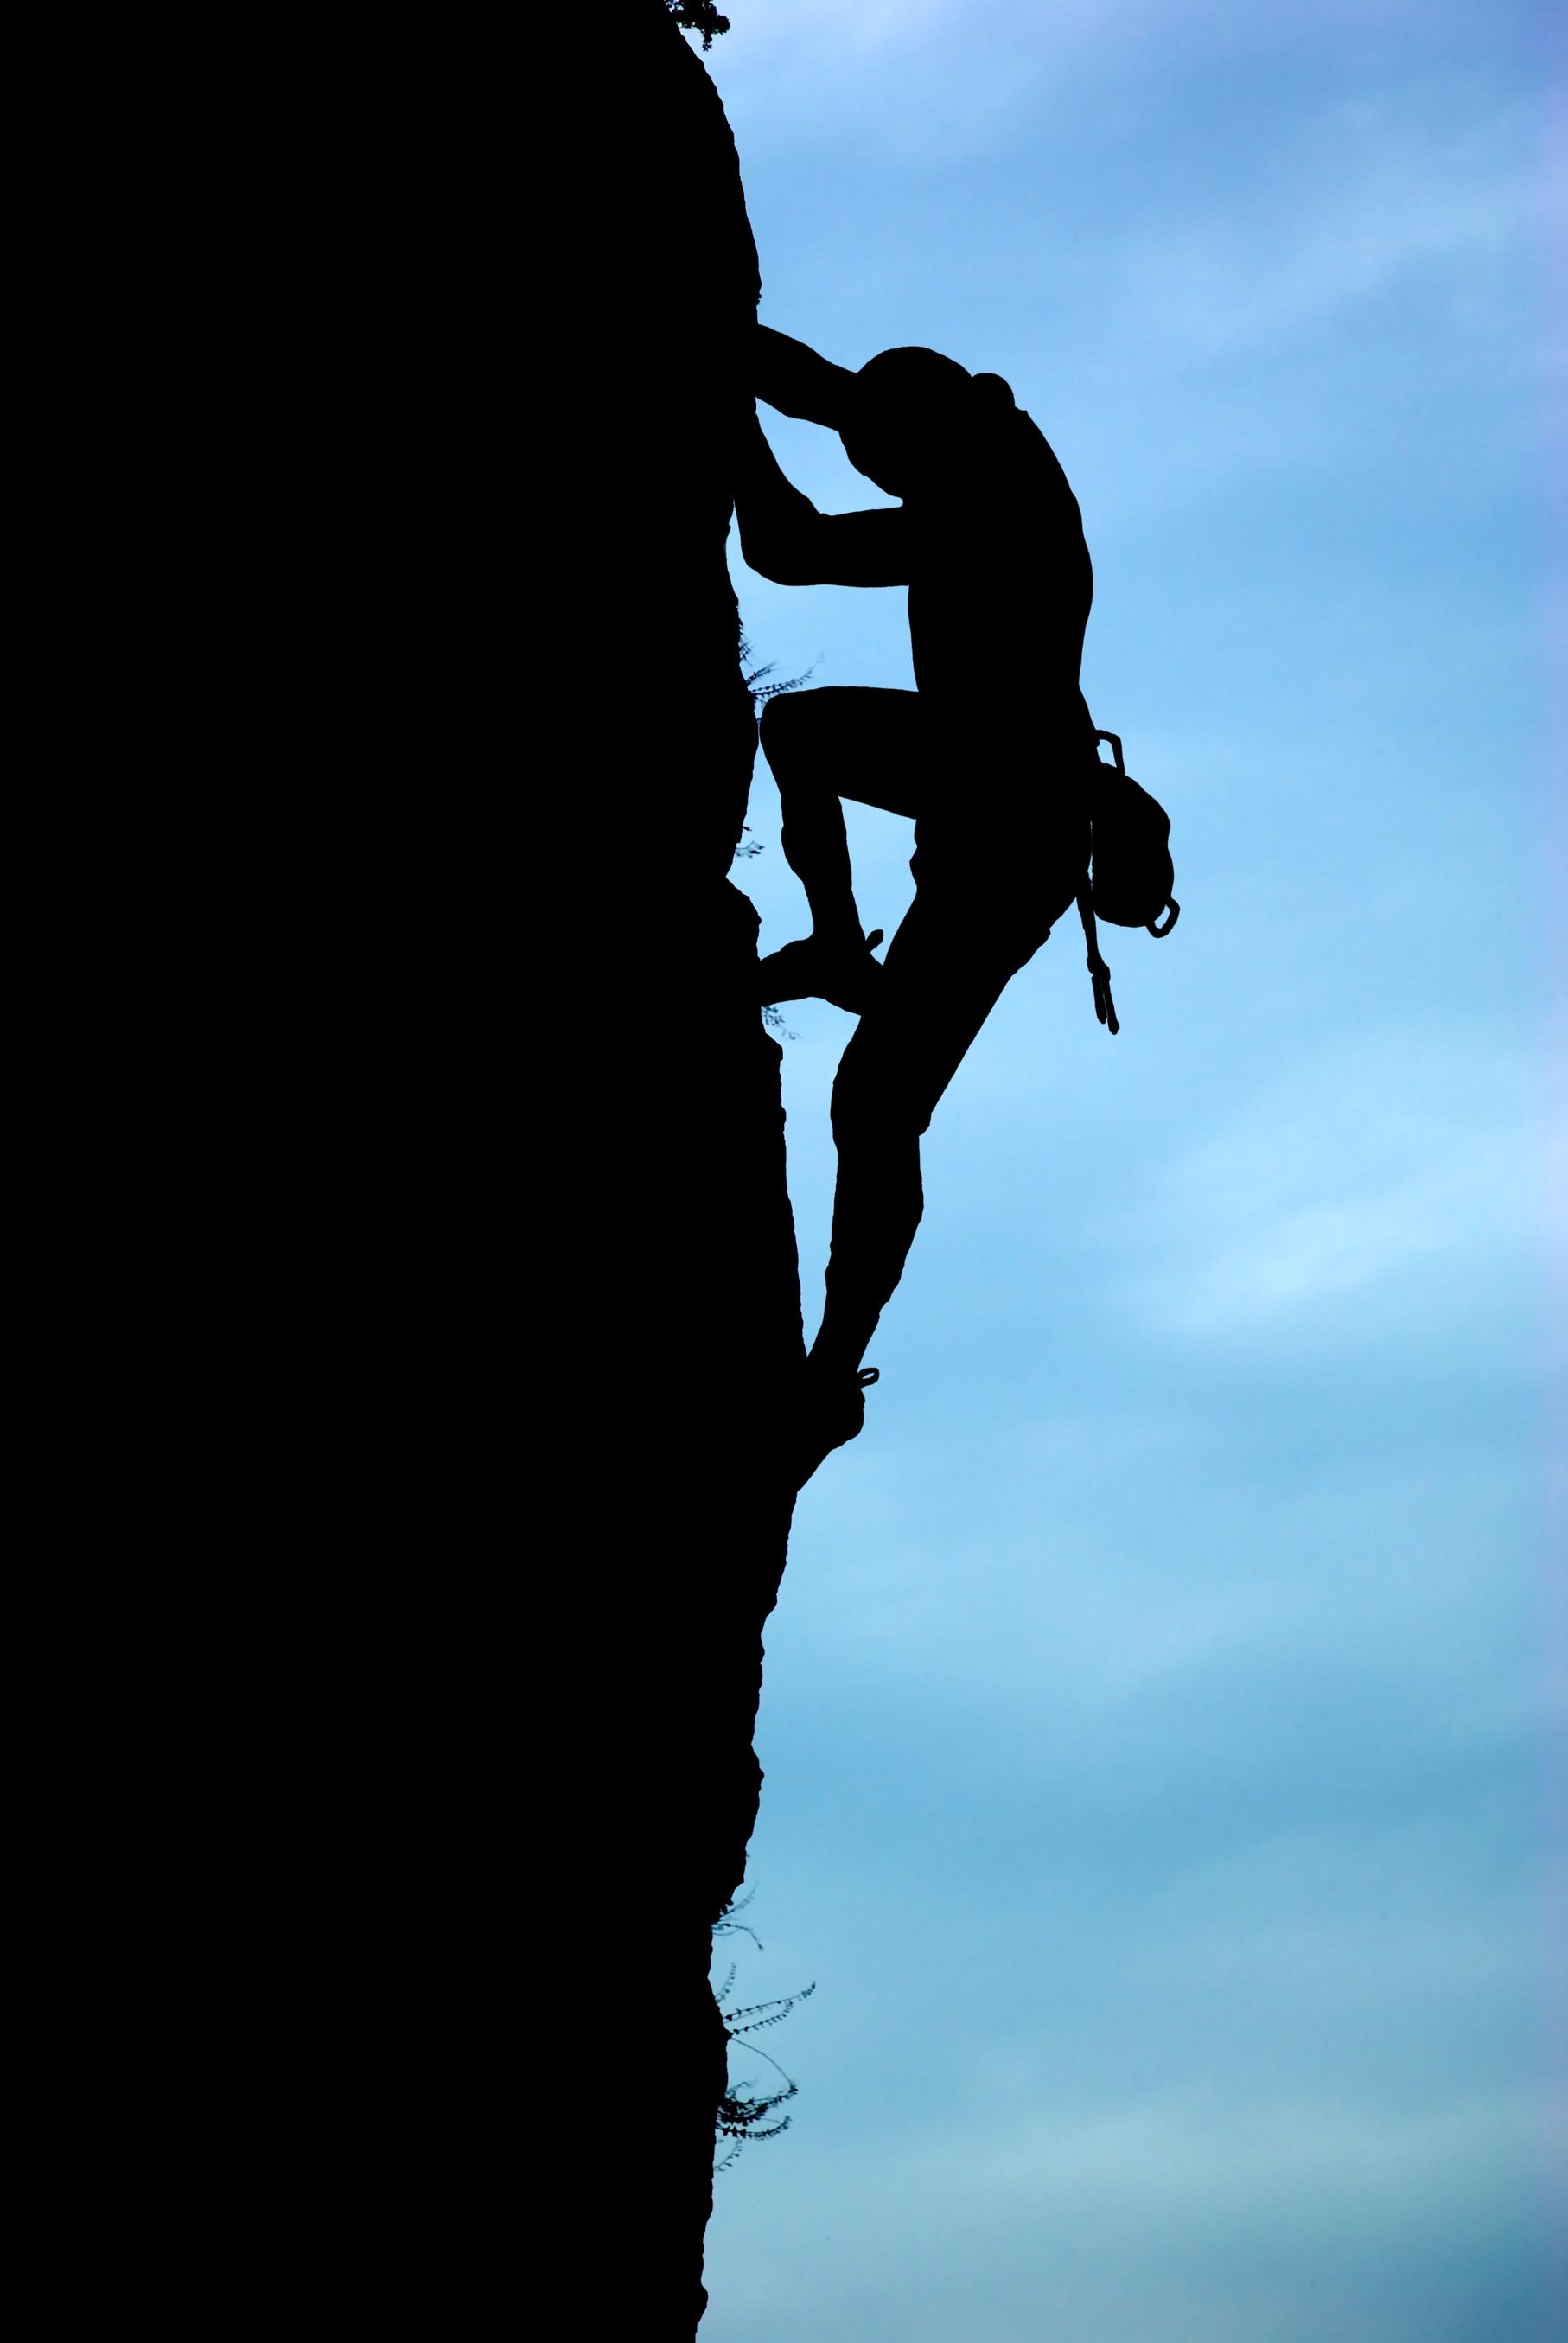 Silhouette of climber.